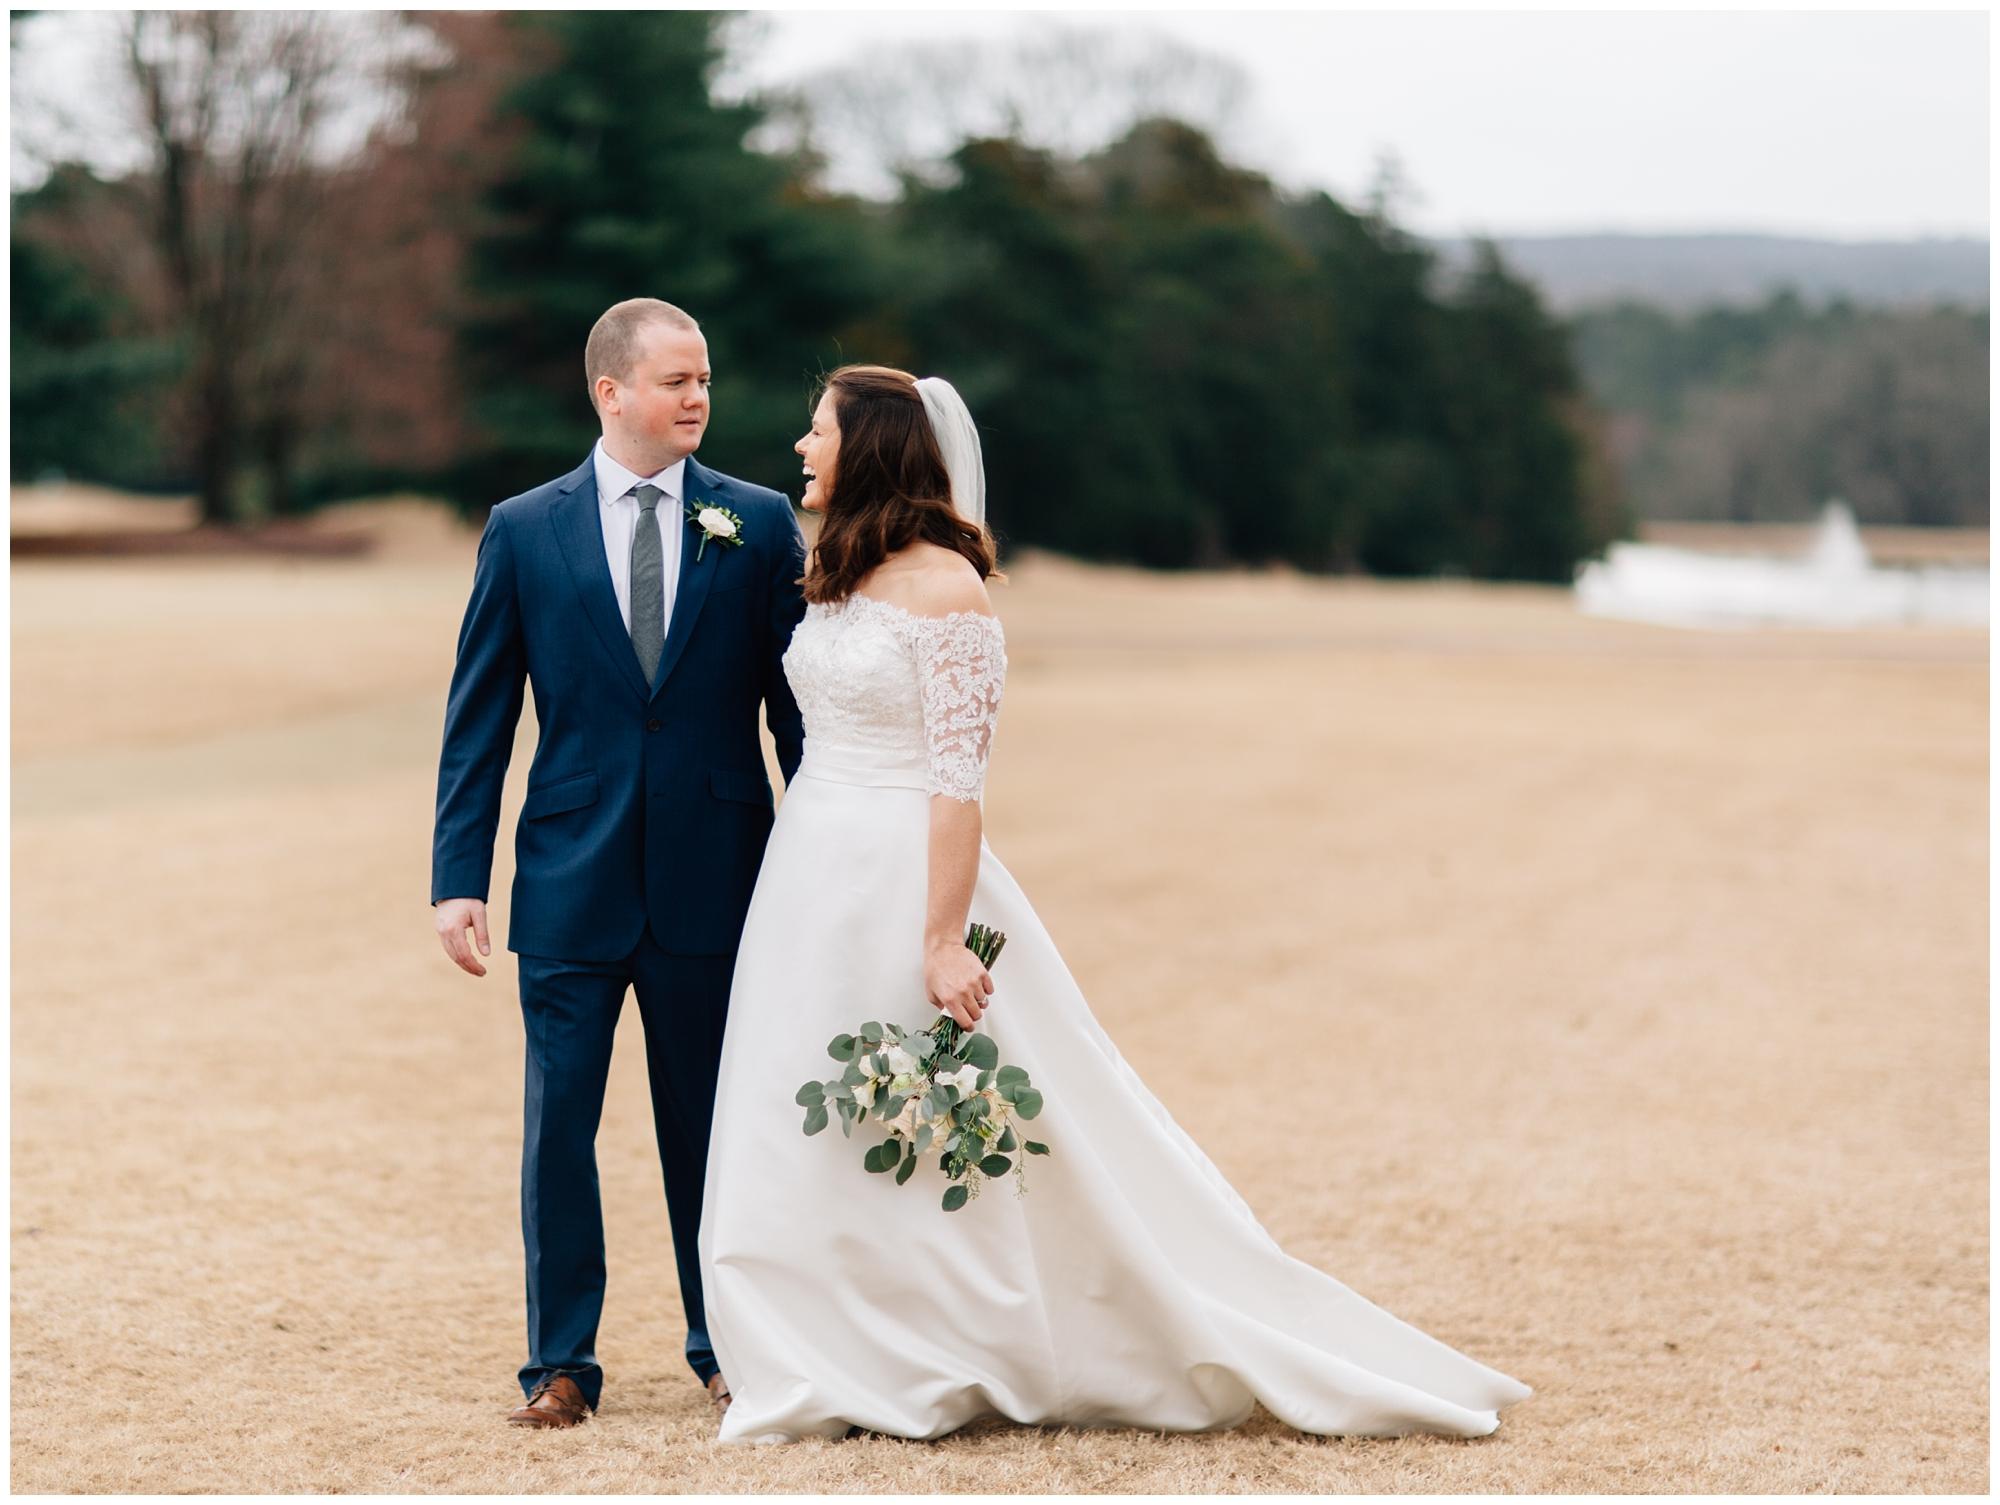 Country-Club-Virginia-Wedding-23.jpg